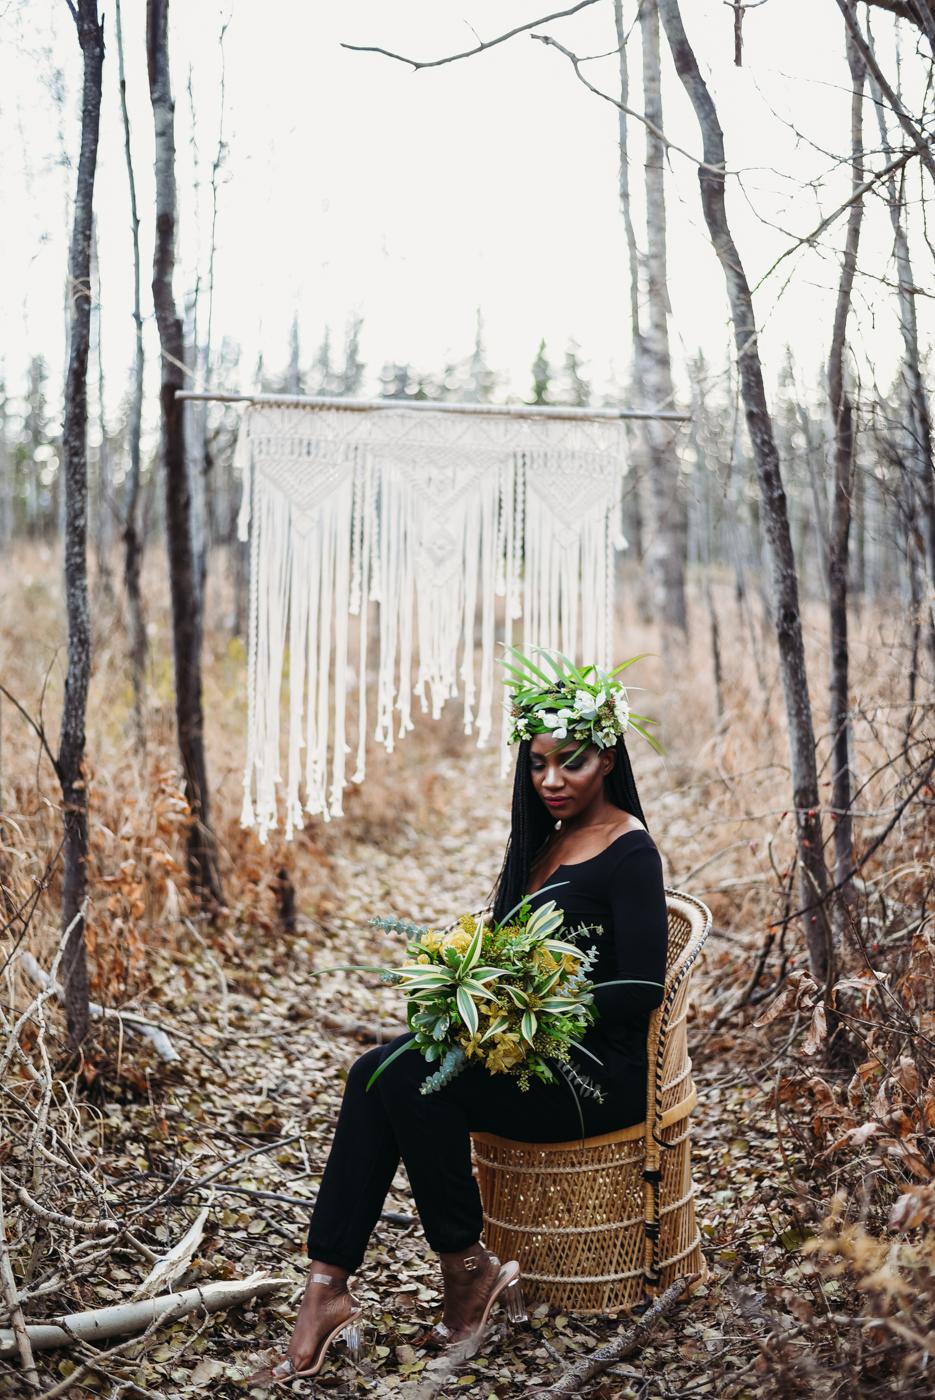 FortSt.John_photographer_TyraEPhotography_Wedding_Couple_Family_Photograhy_DawsonCreek_Elopement_Bride_Boduoir_Portraits-16.jpg